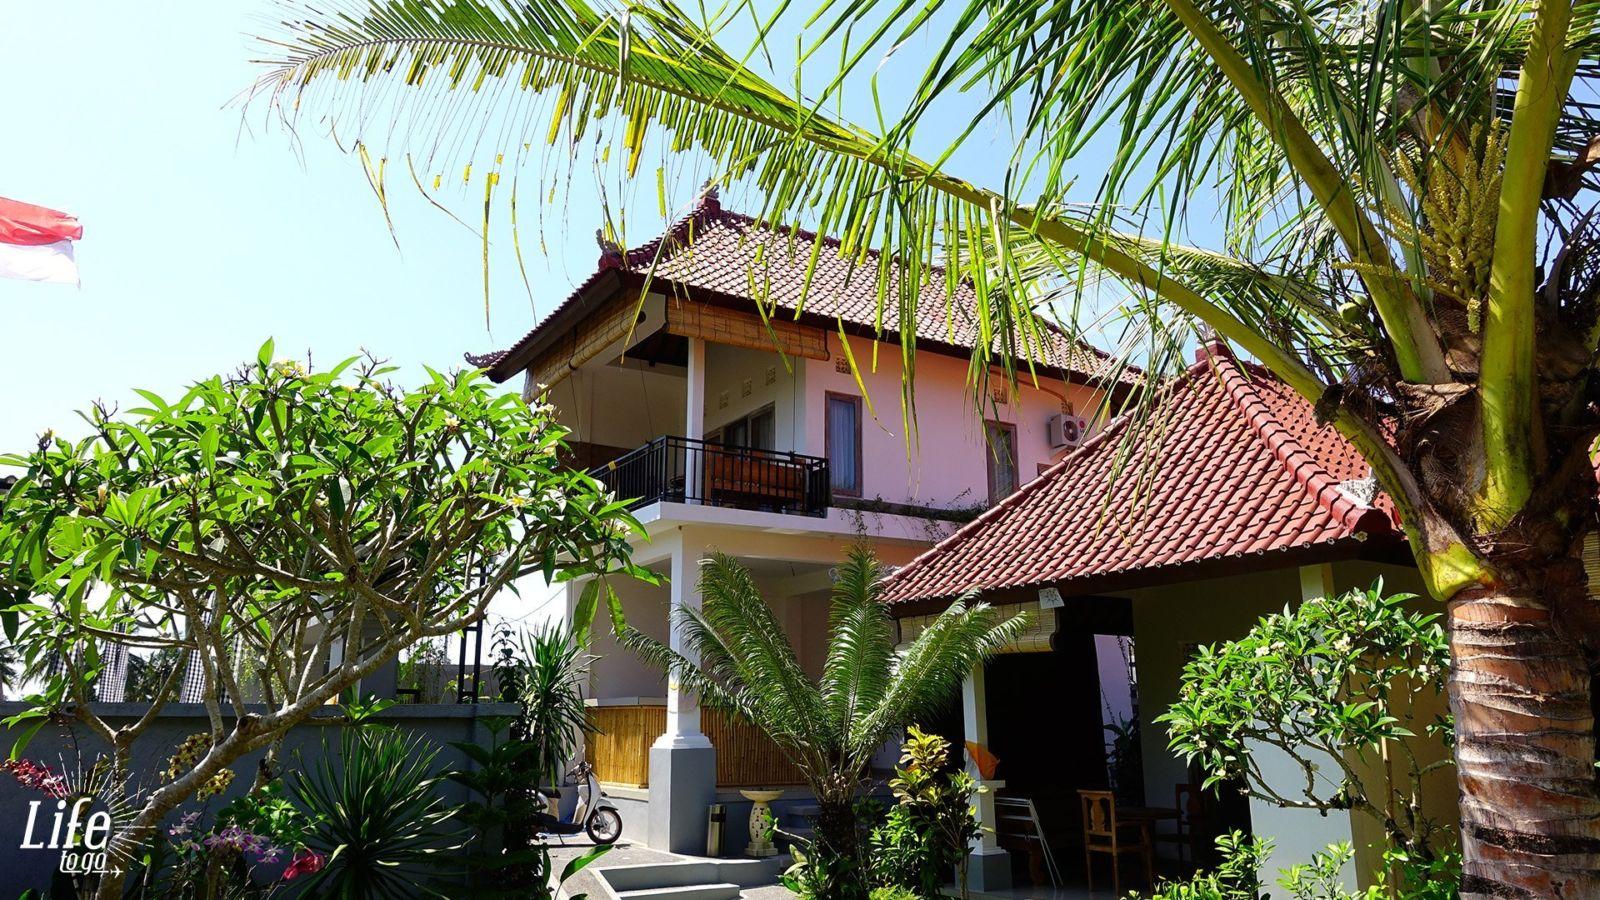 geniale unterkunft in ubud auf bali villa di sawah. Black Bedroom Furniture Sets. Home Design Ideas